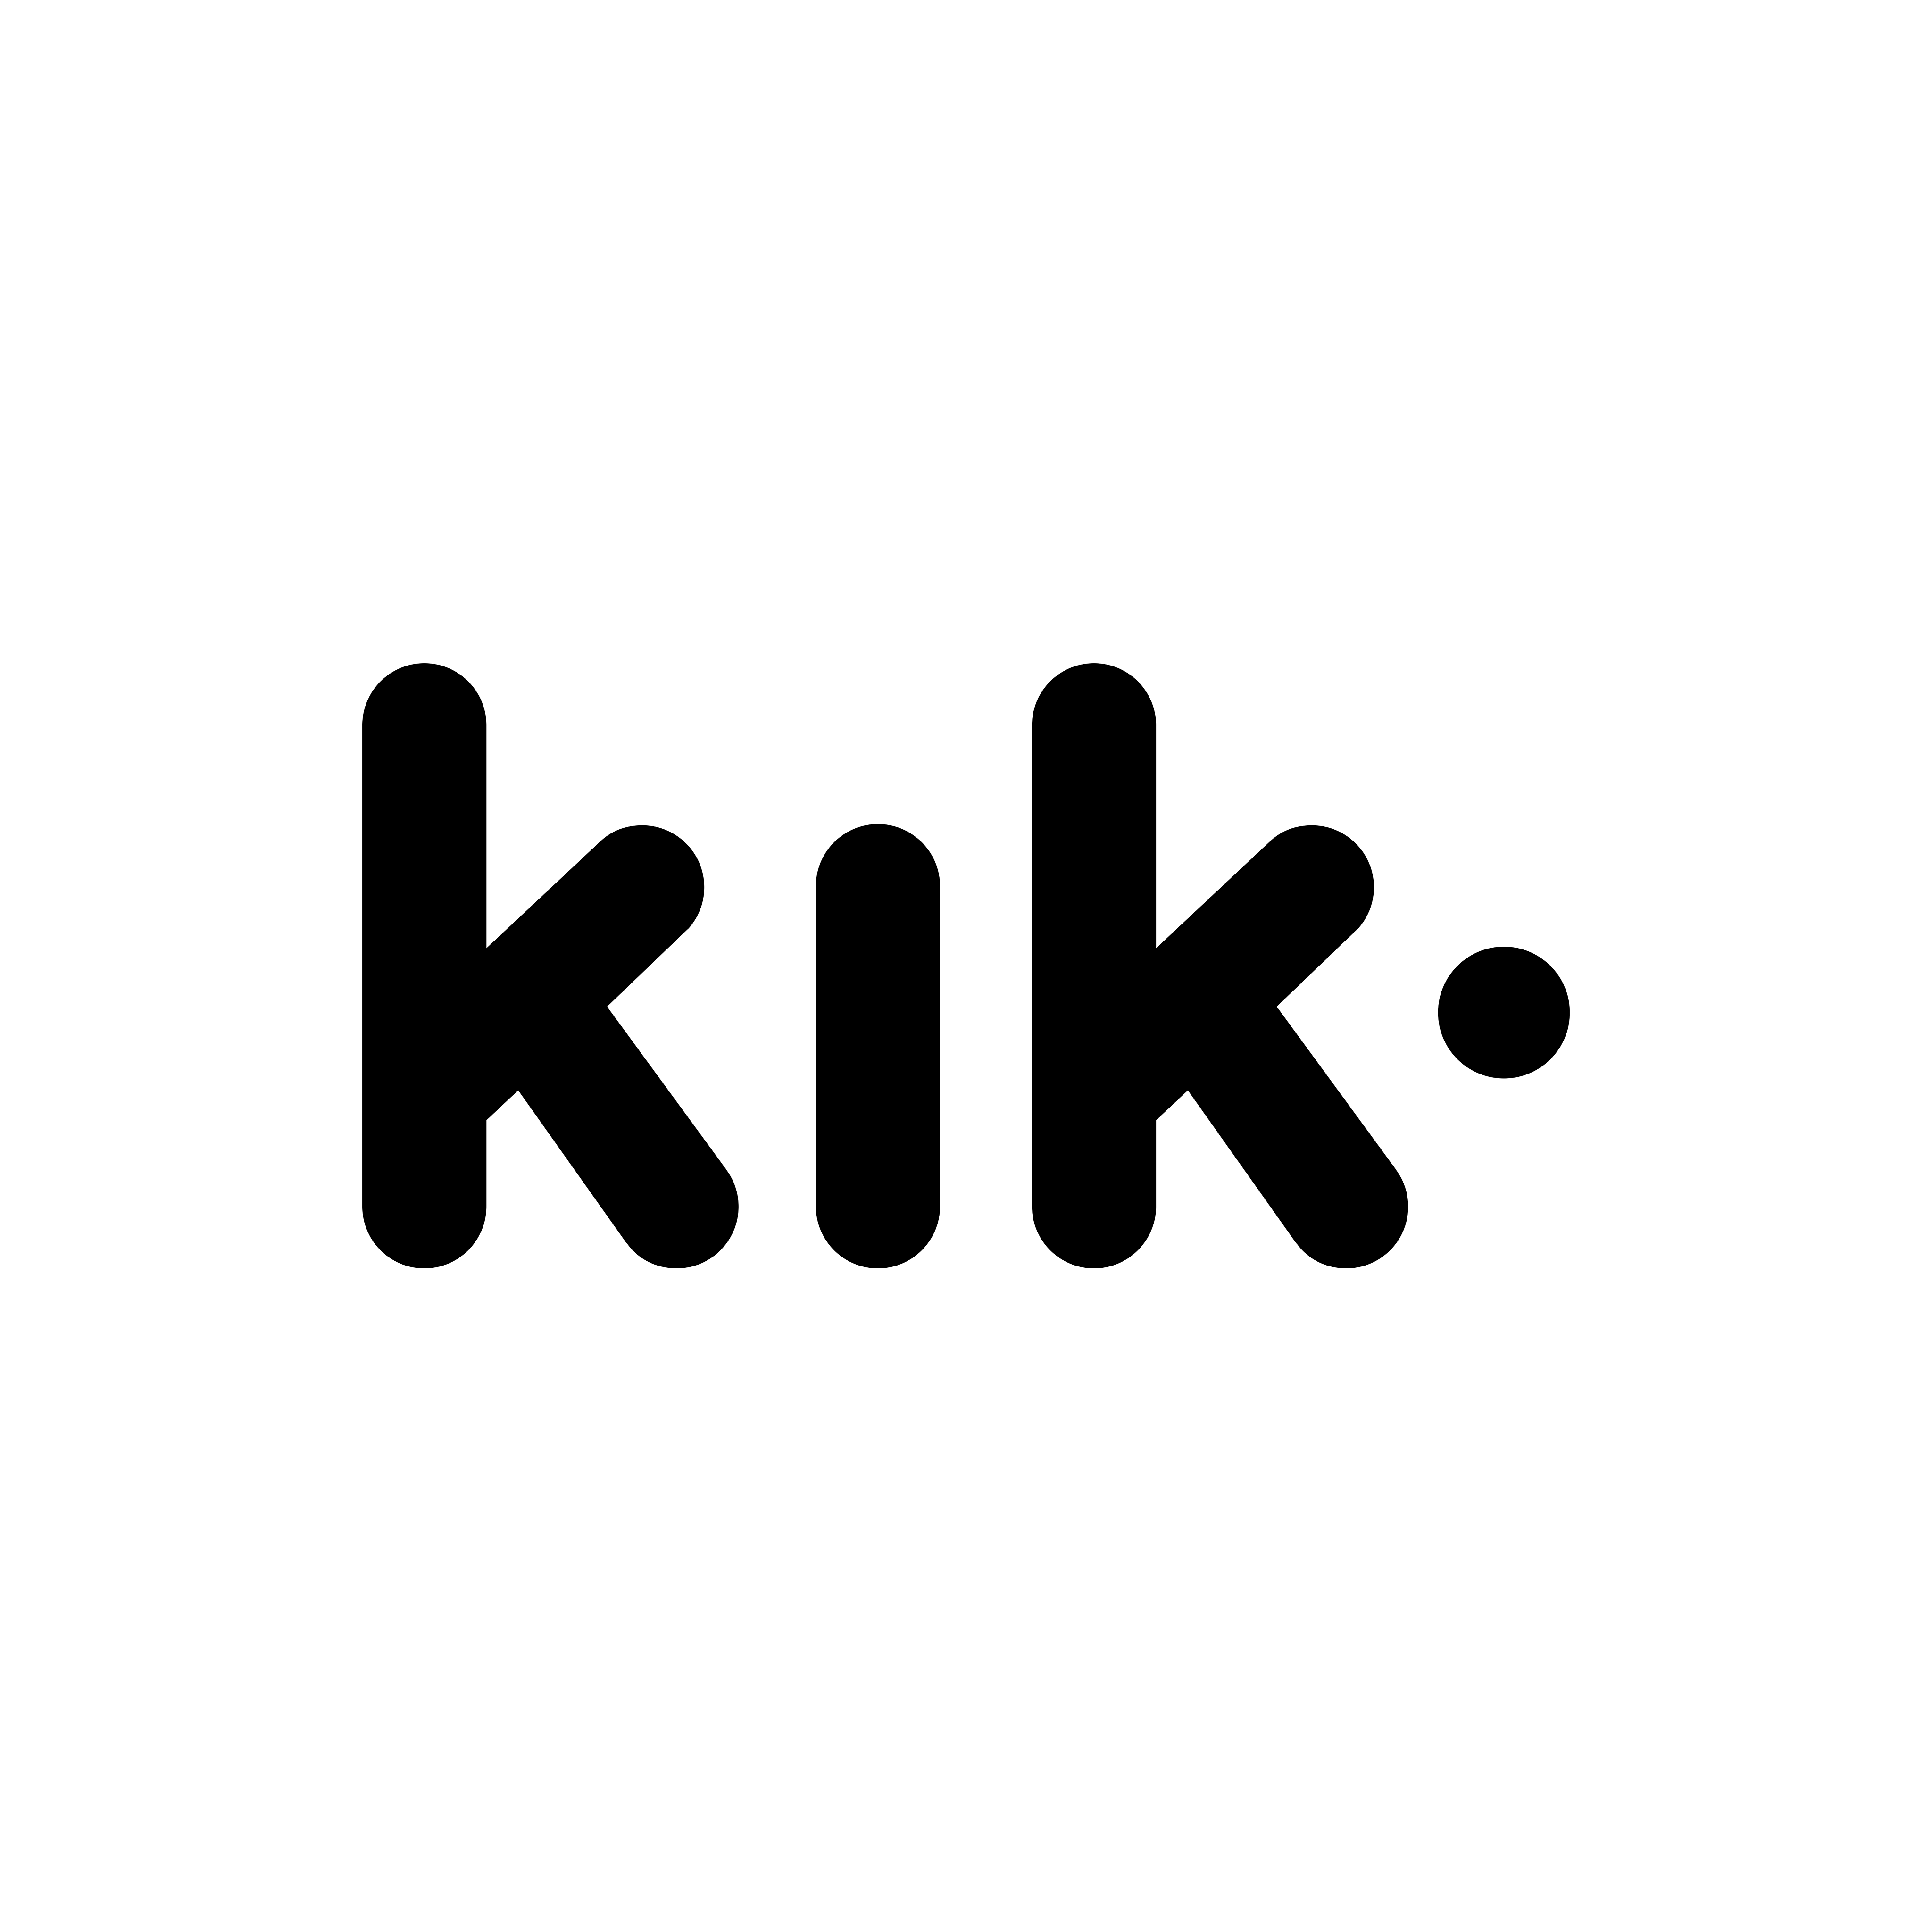 black, kik icon